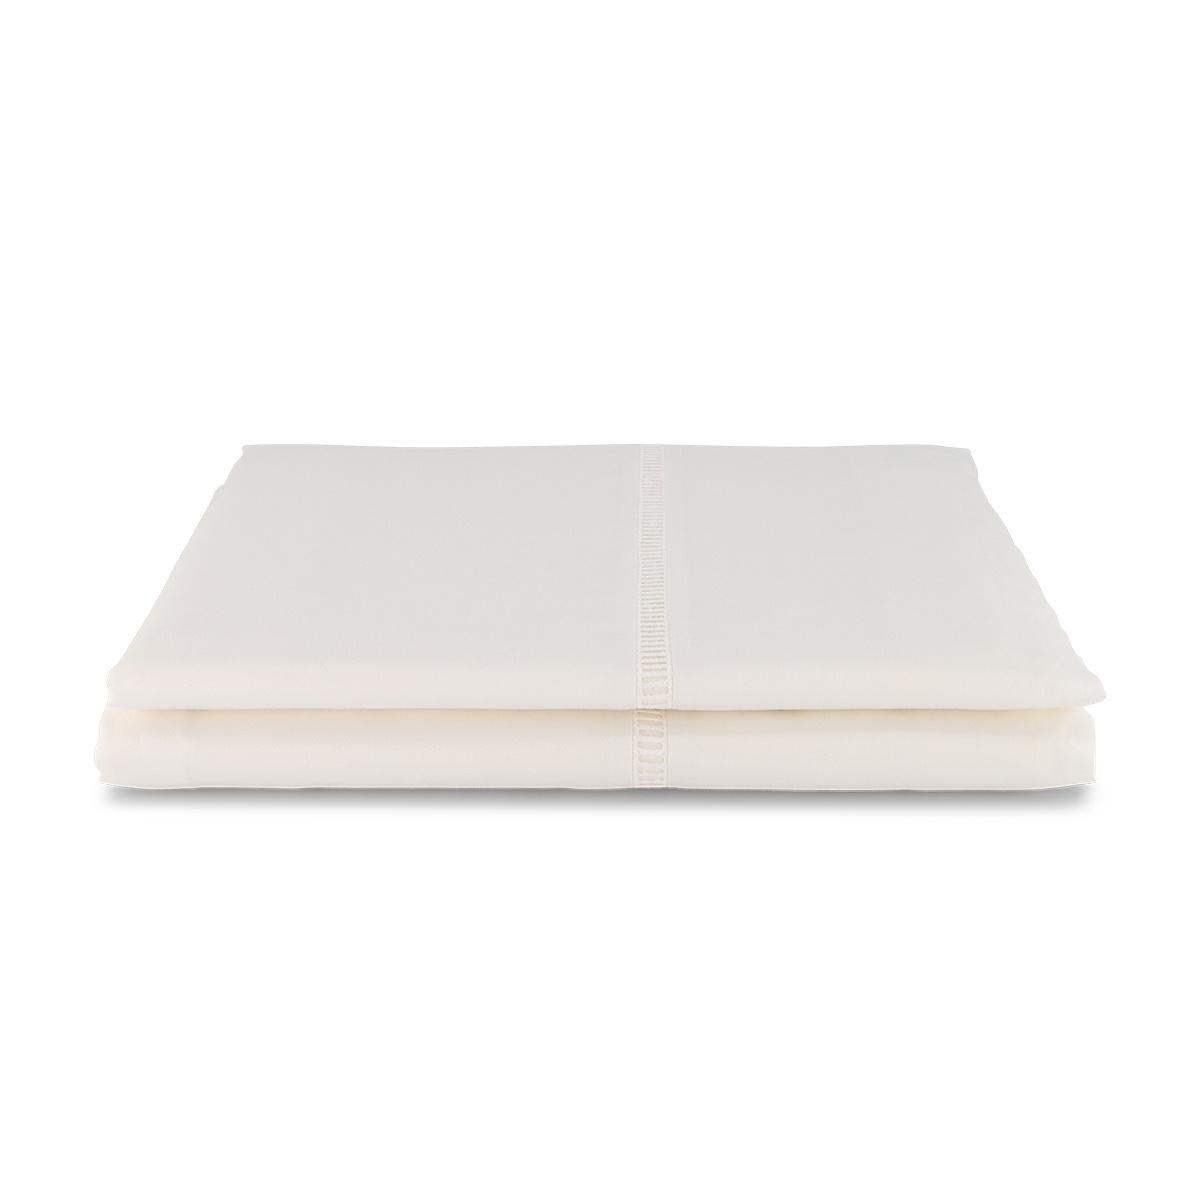 Venezia Flat Sheet, Cream White